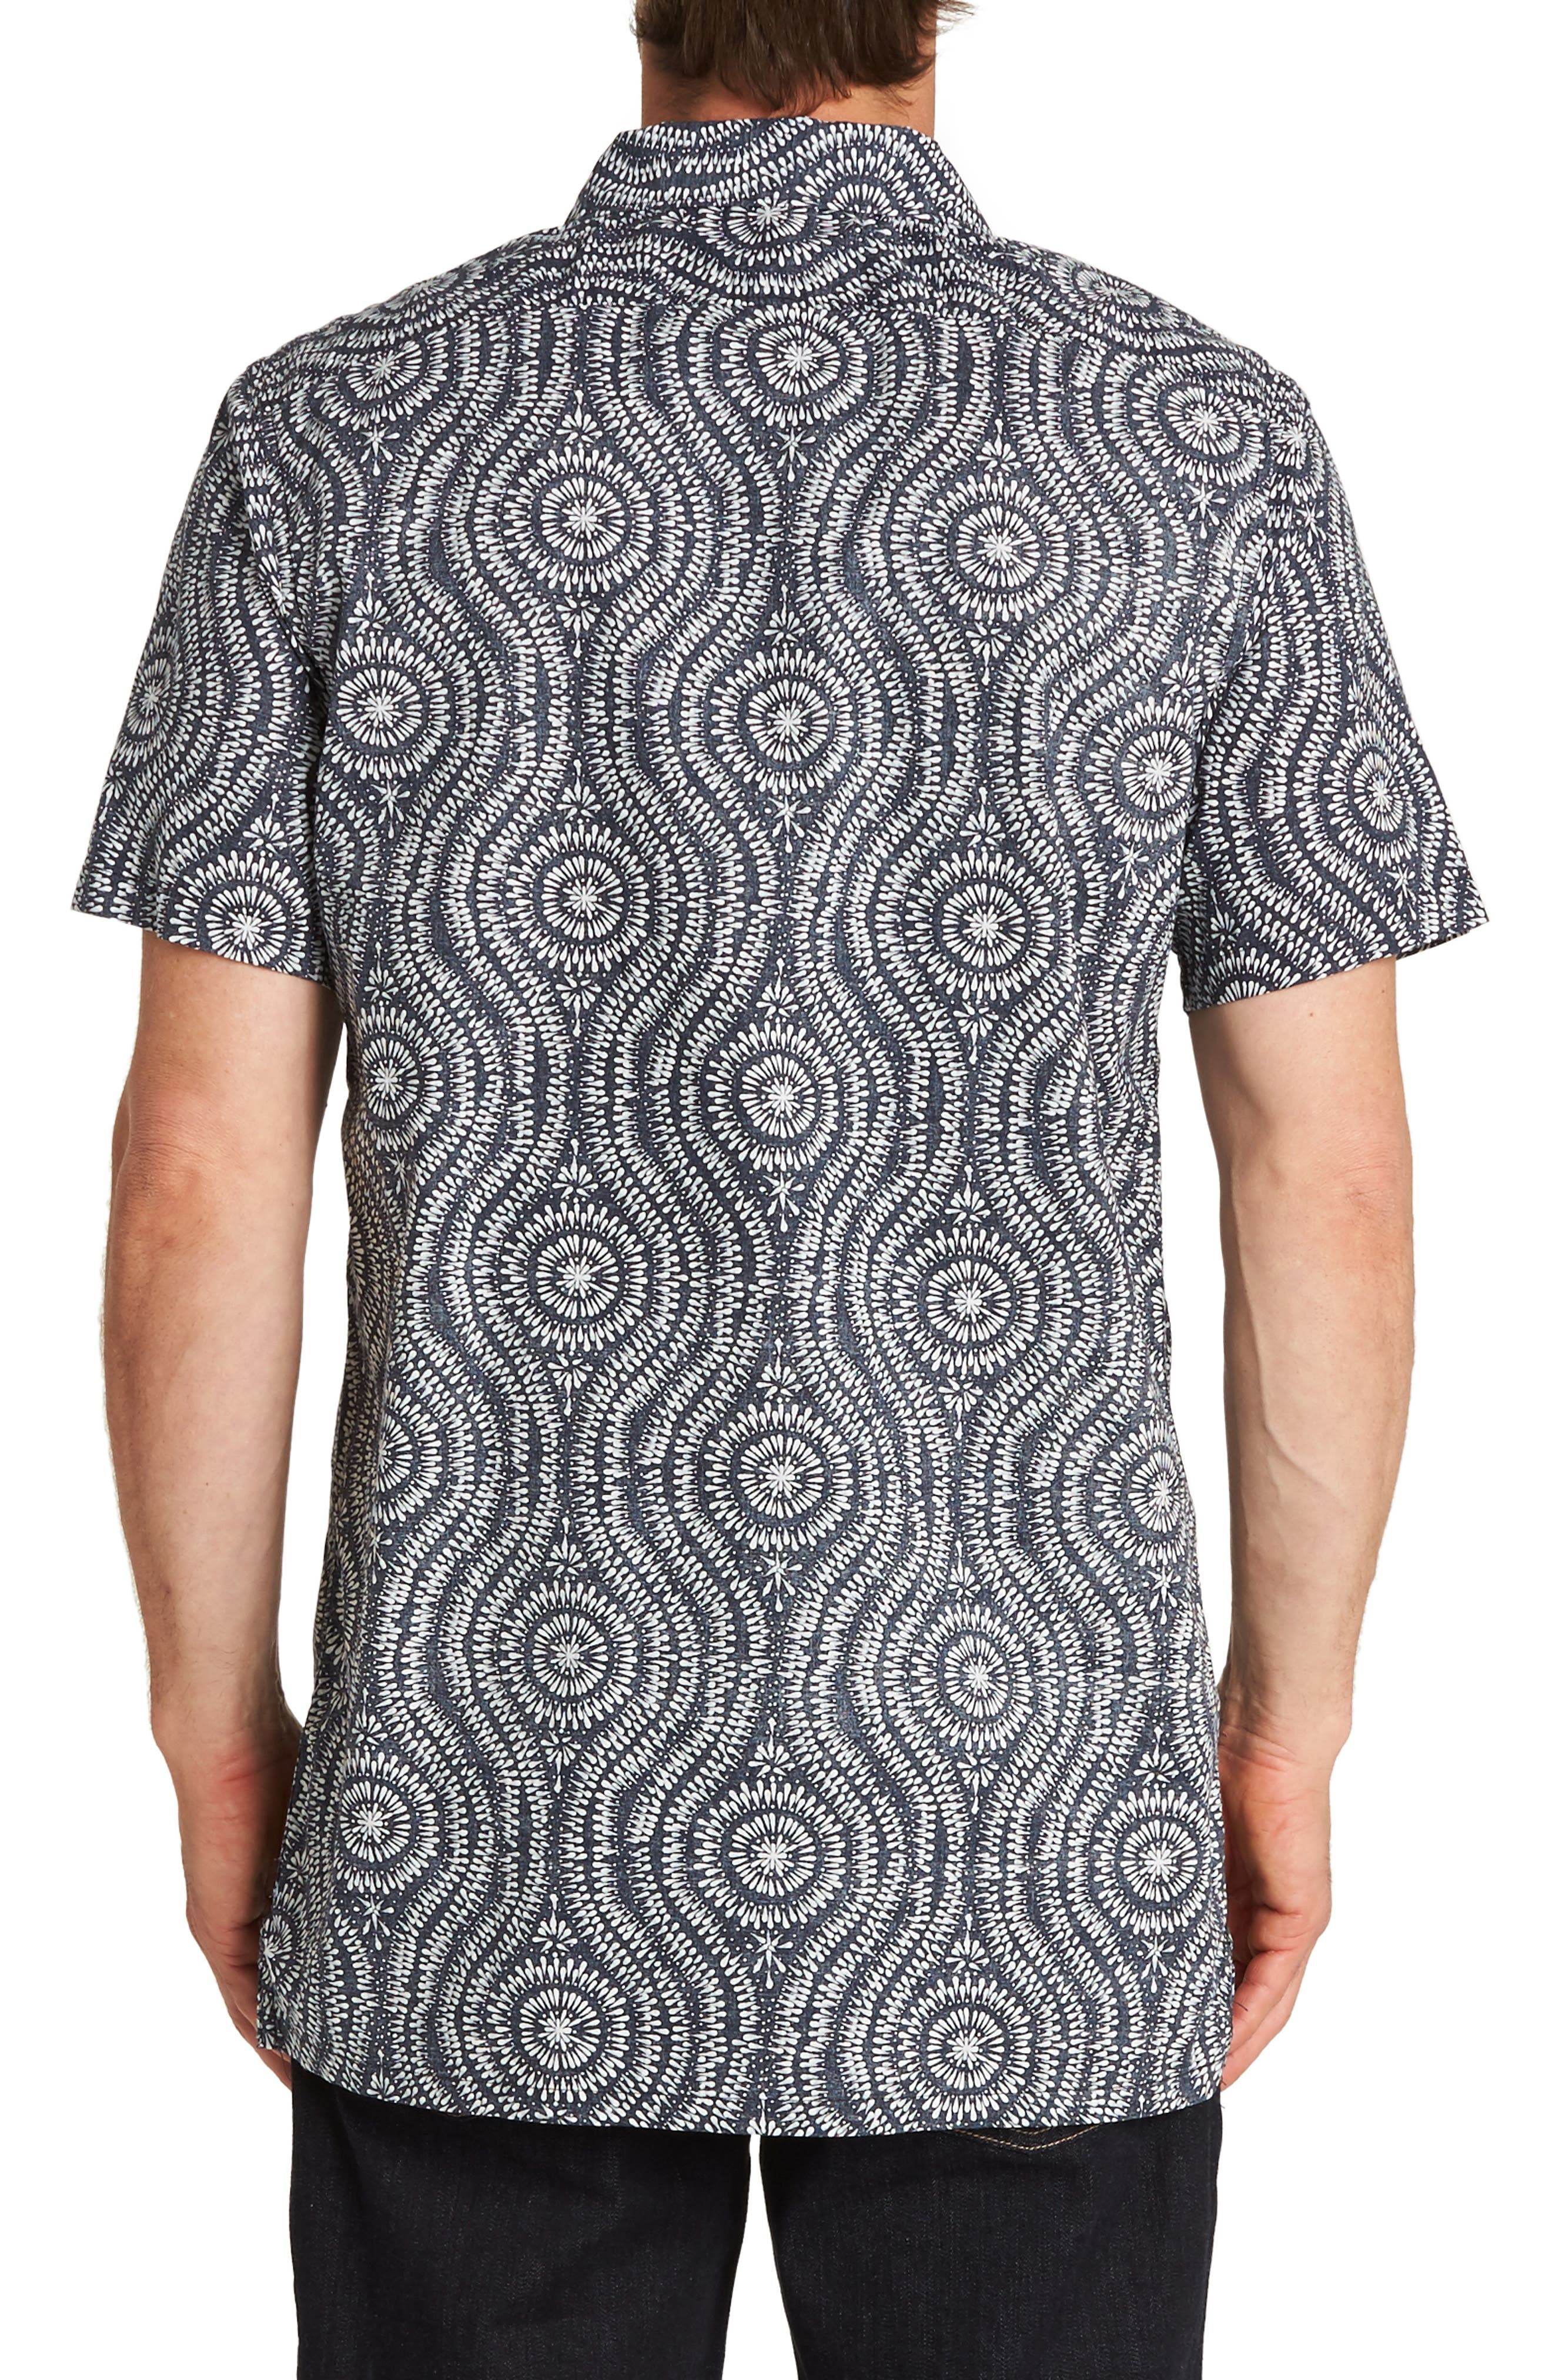 Cosmic Patterned Camp Shirt,                             Alternate thumbnail 2, color,                             INDIGO